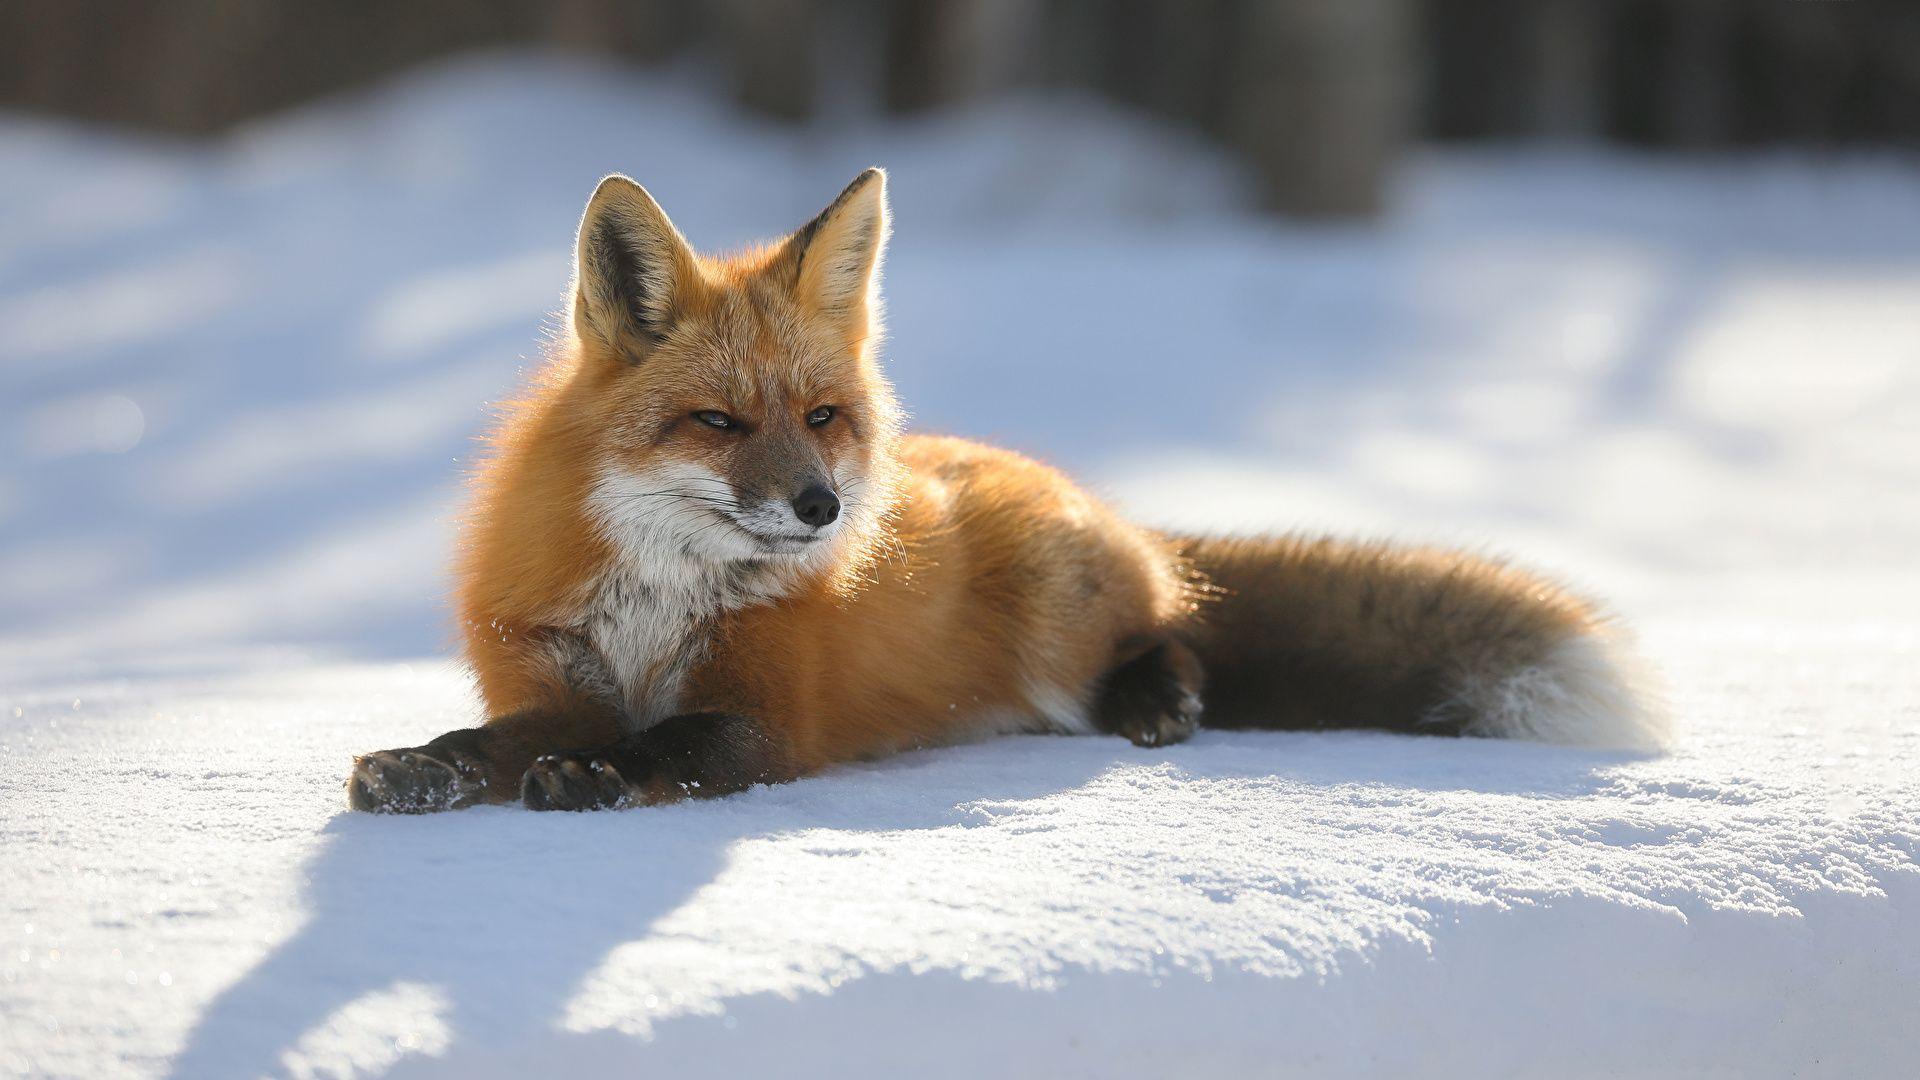 Fox Winter Photo